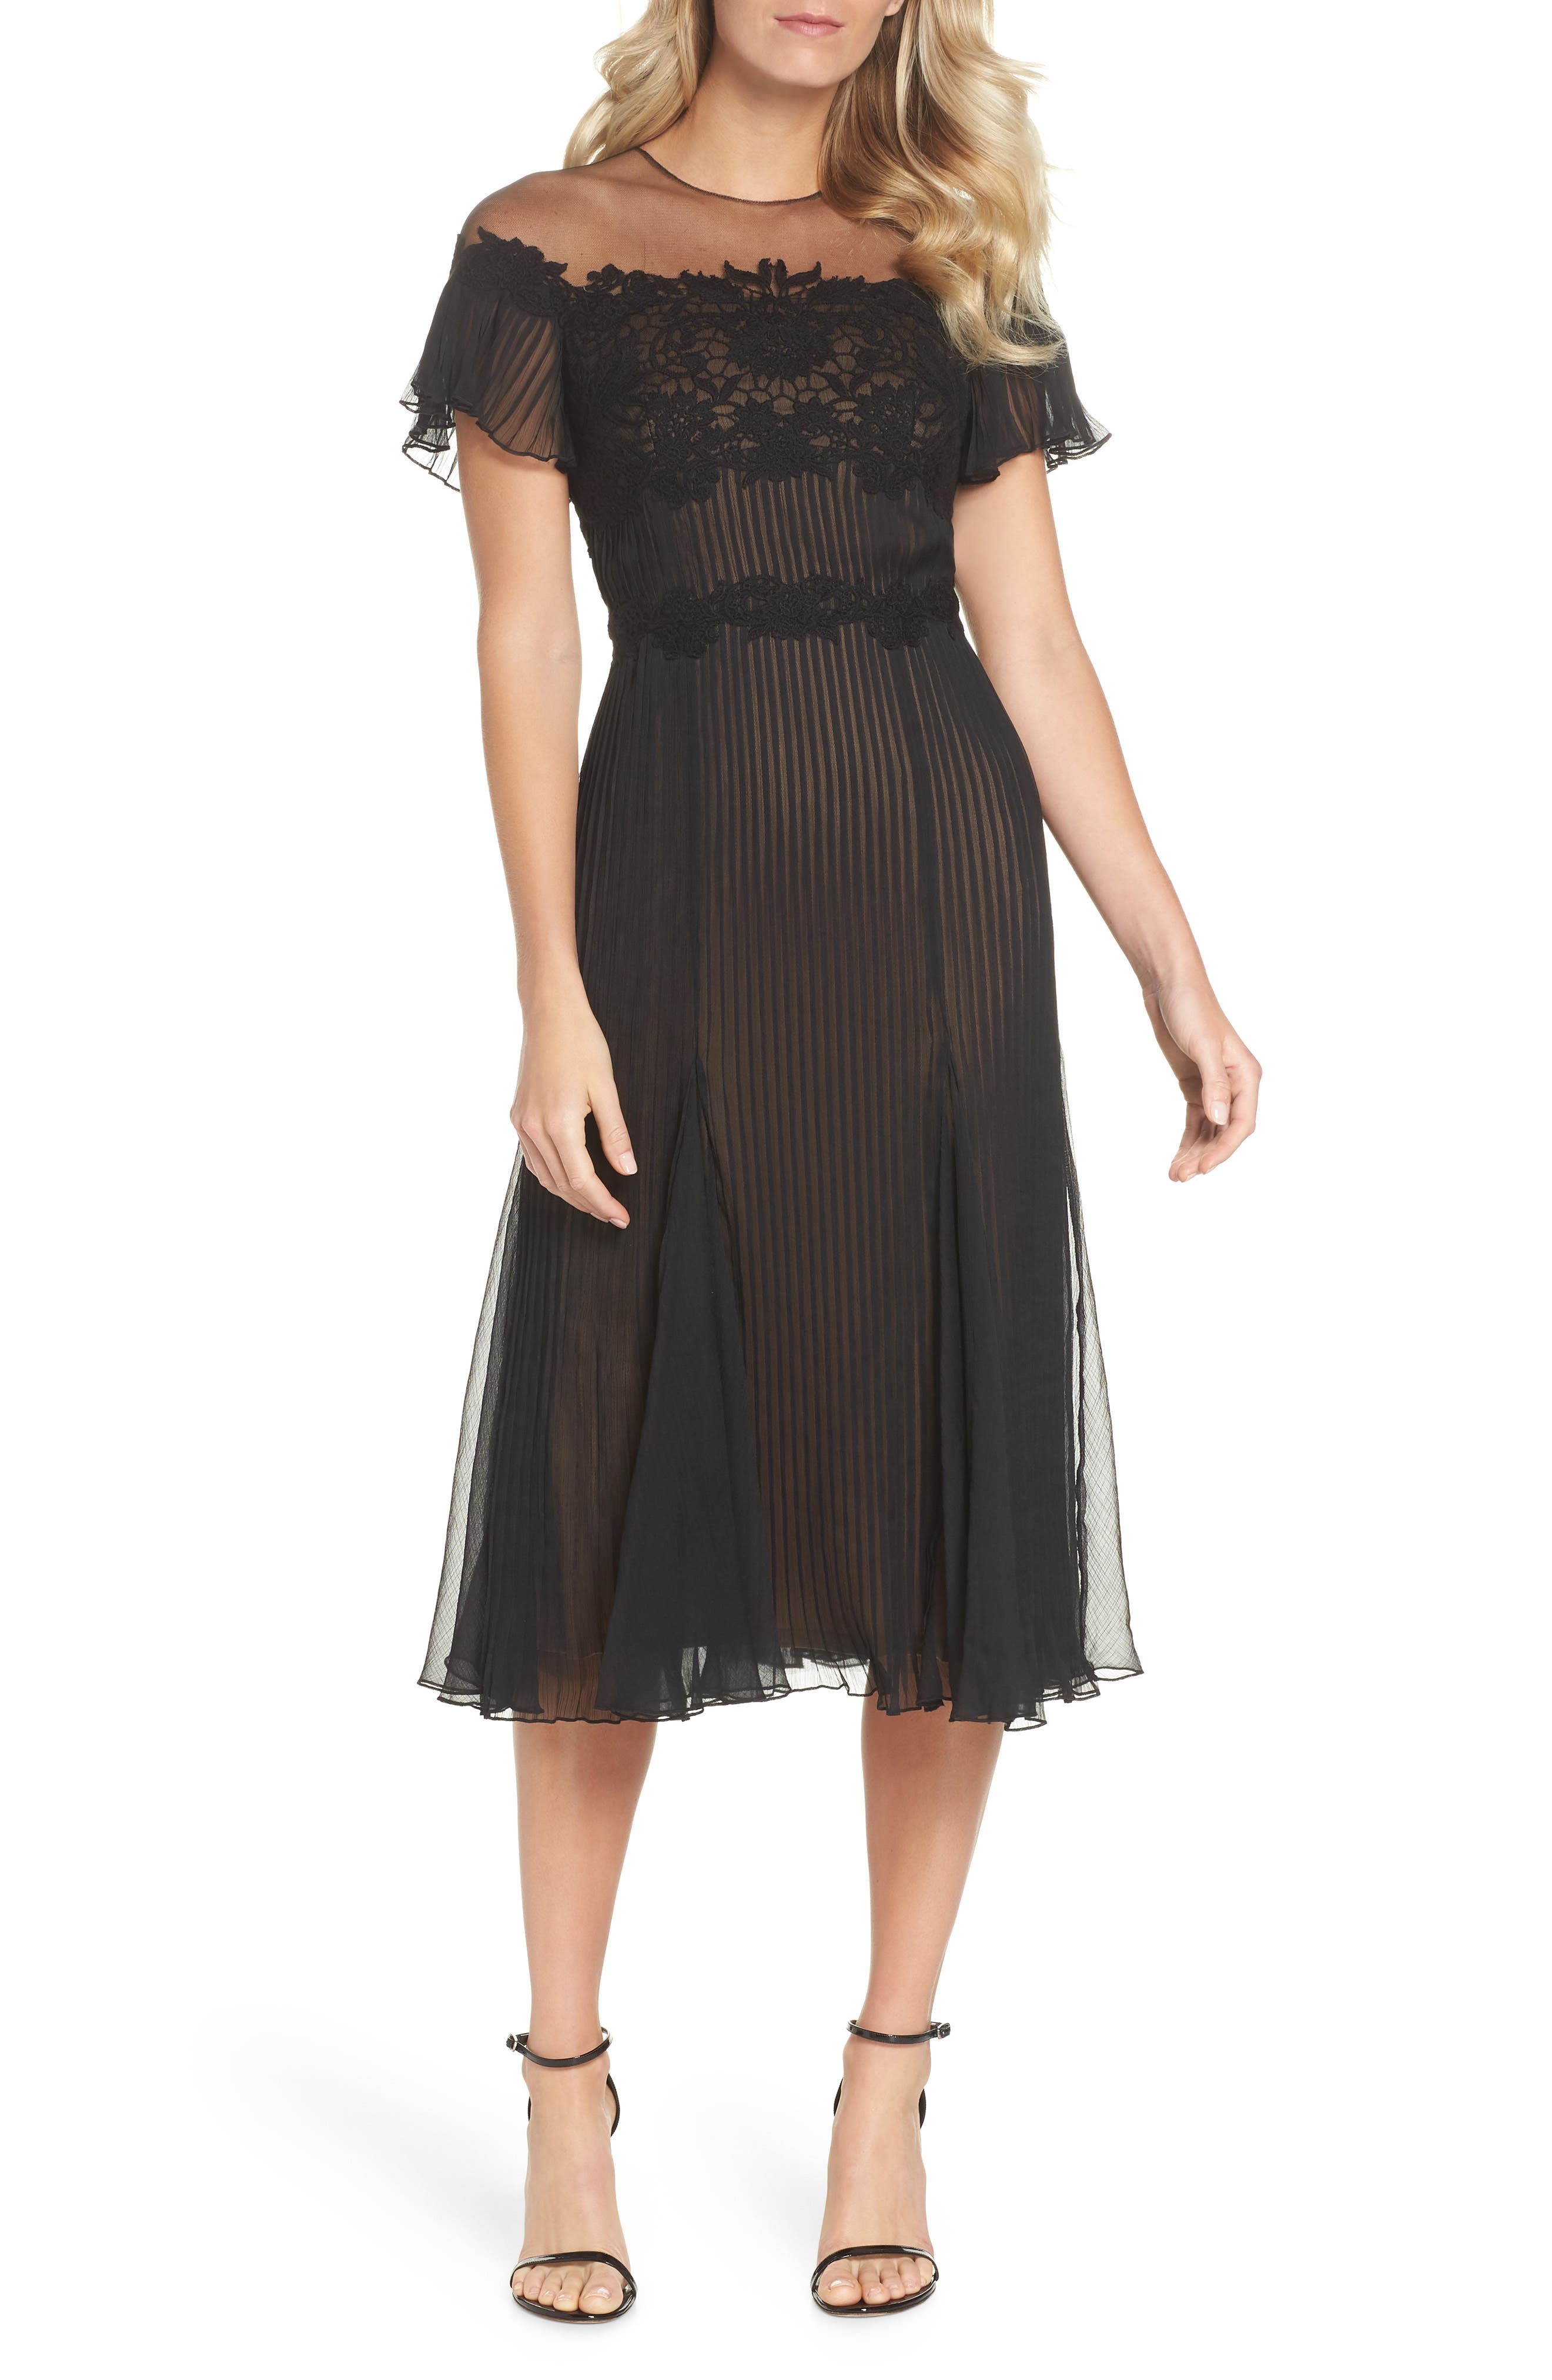 Lace & Chiffon A-Line Dress,                             Main thumbnail 1, color,                             Black/ Nude